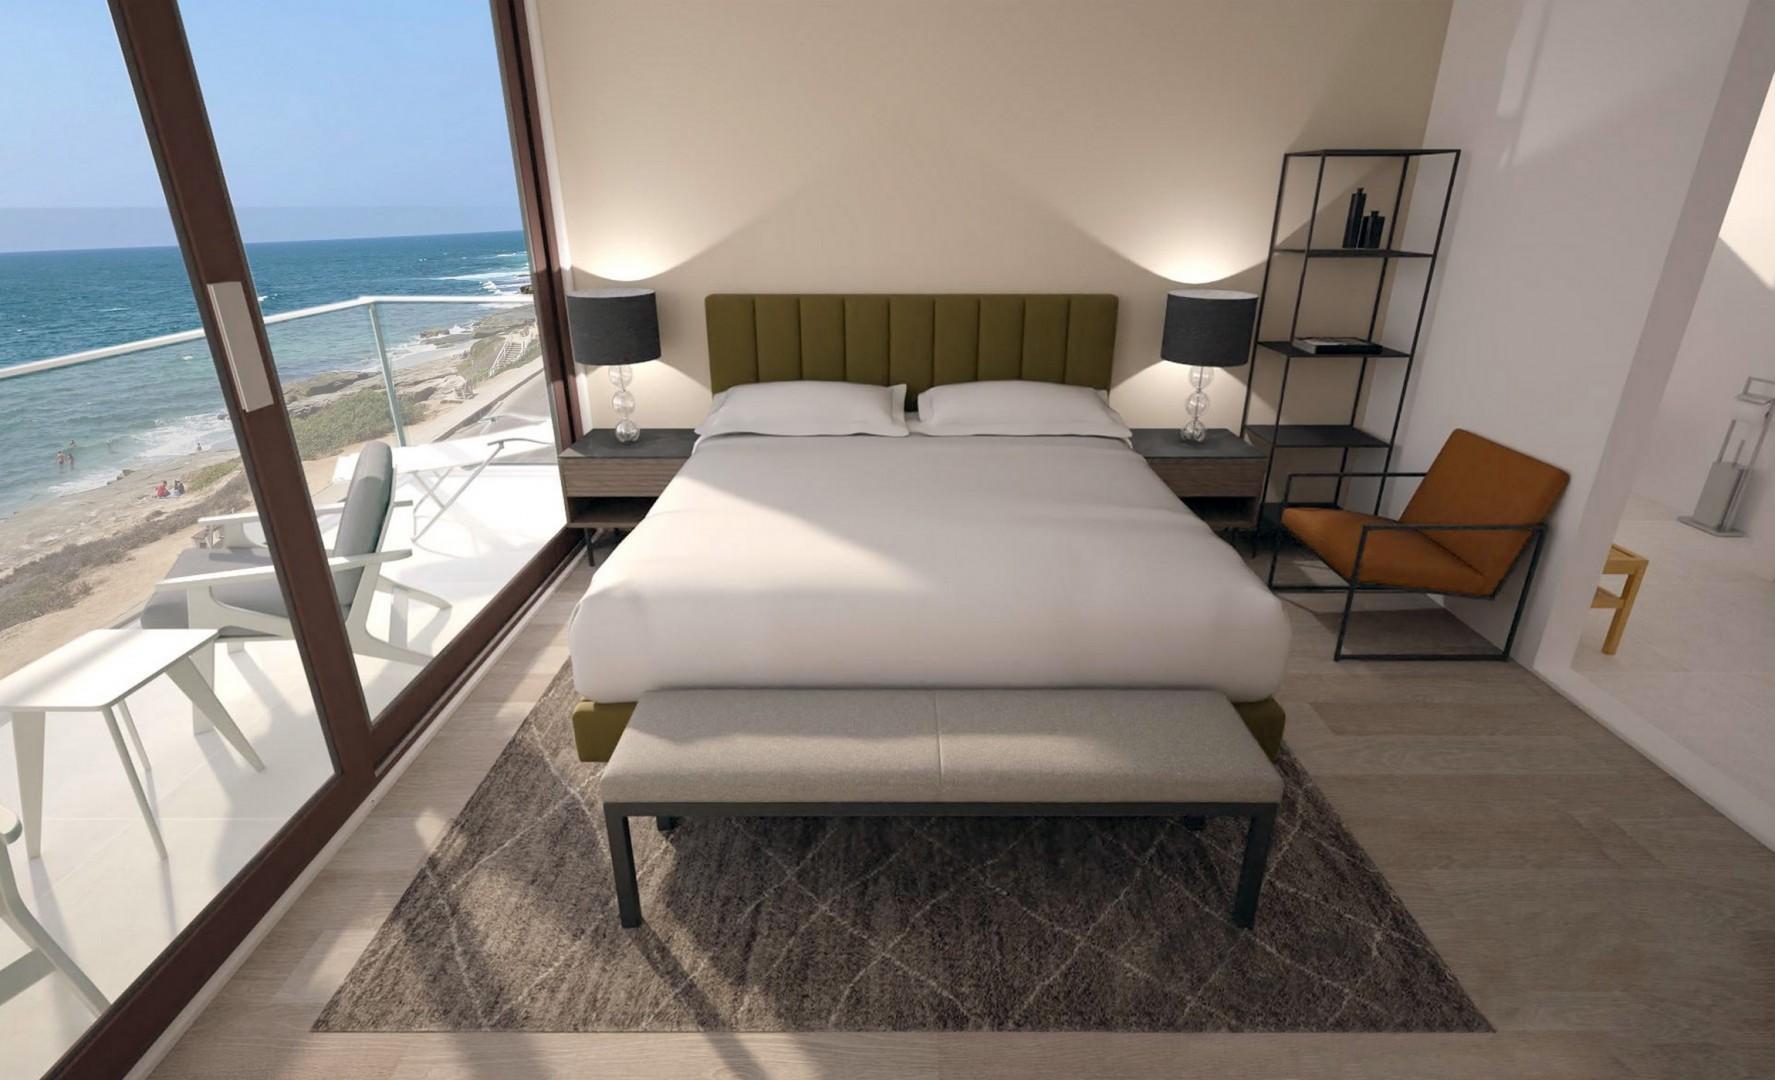 Oceanfront Suite with lie-down ocean views